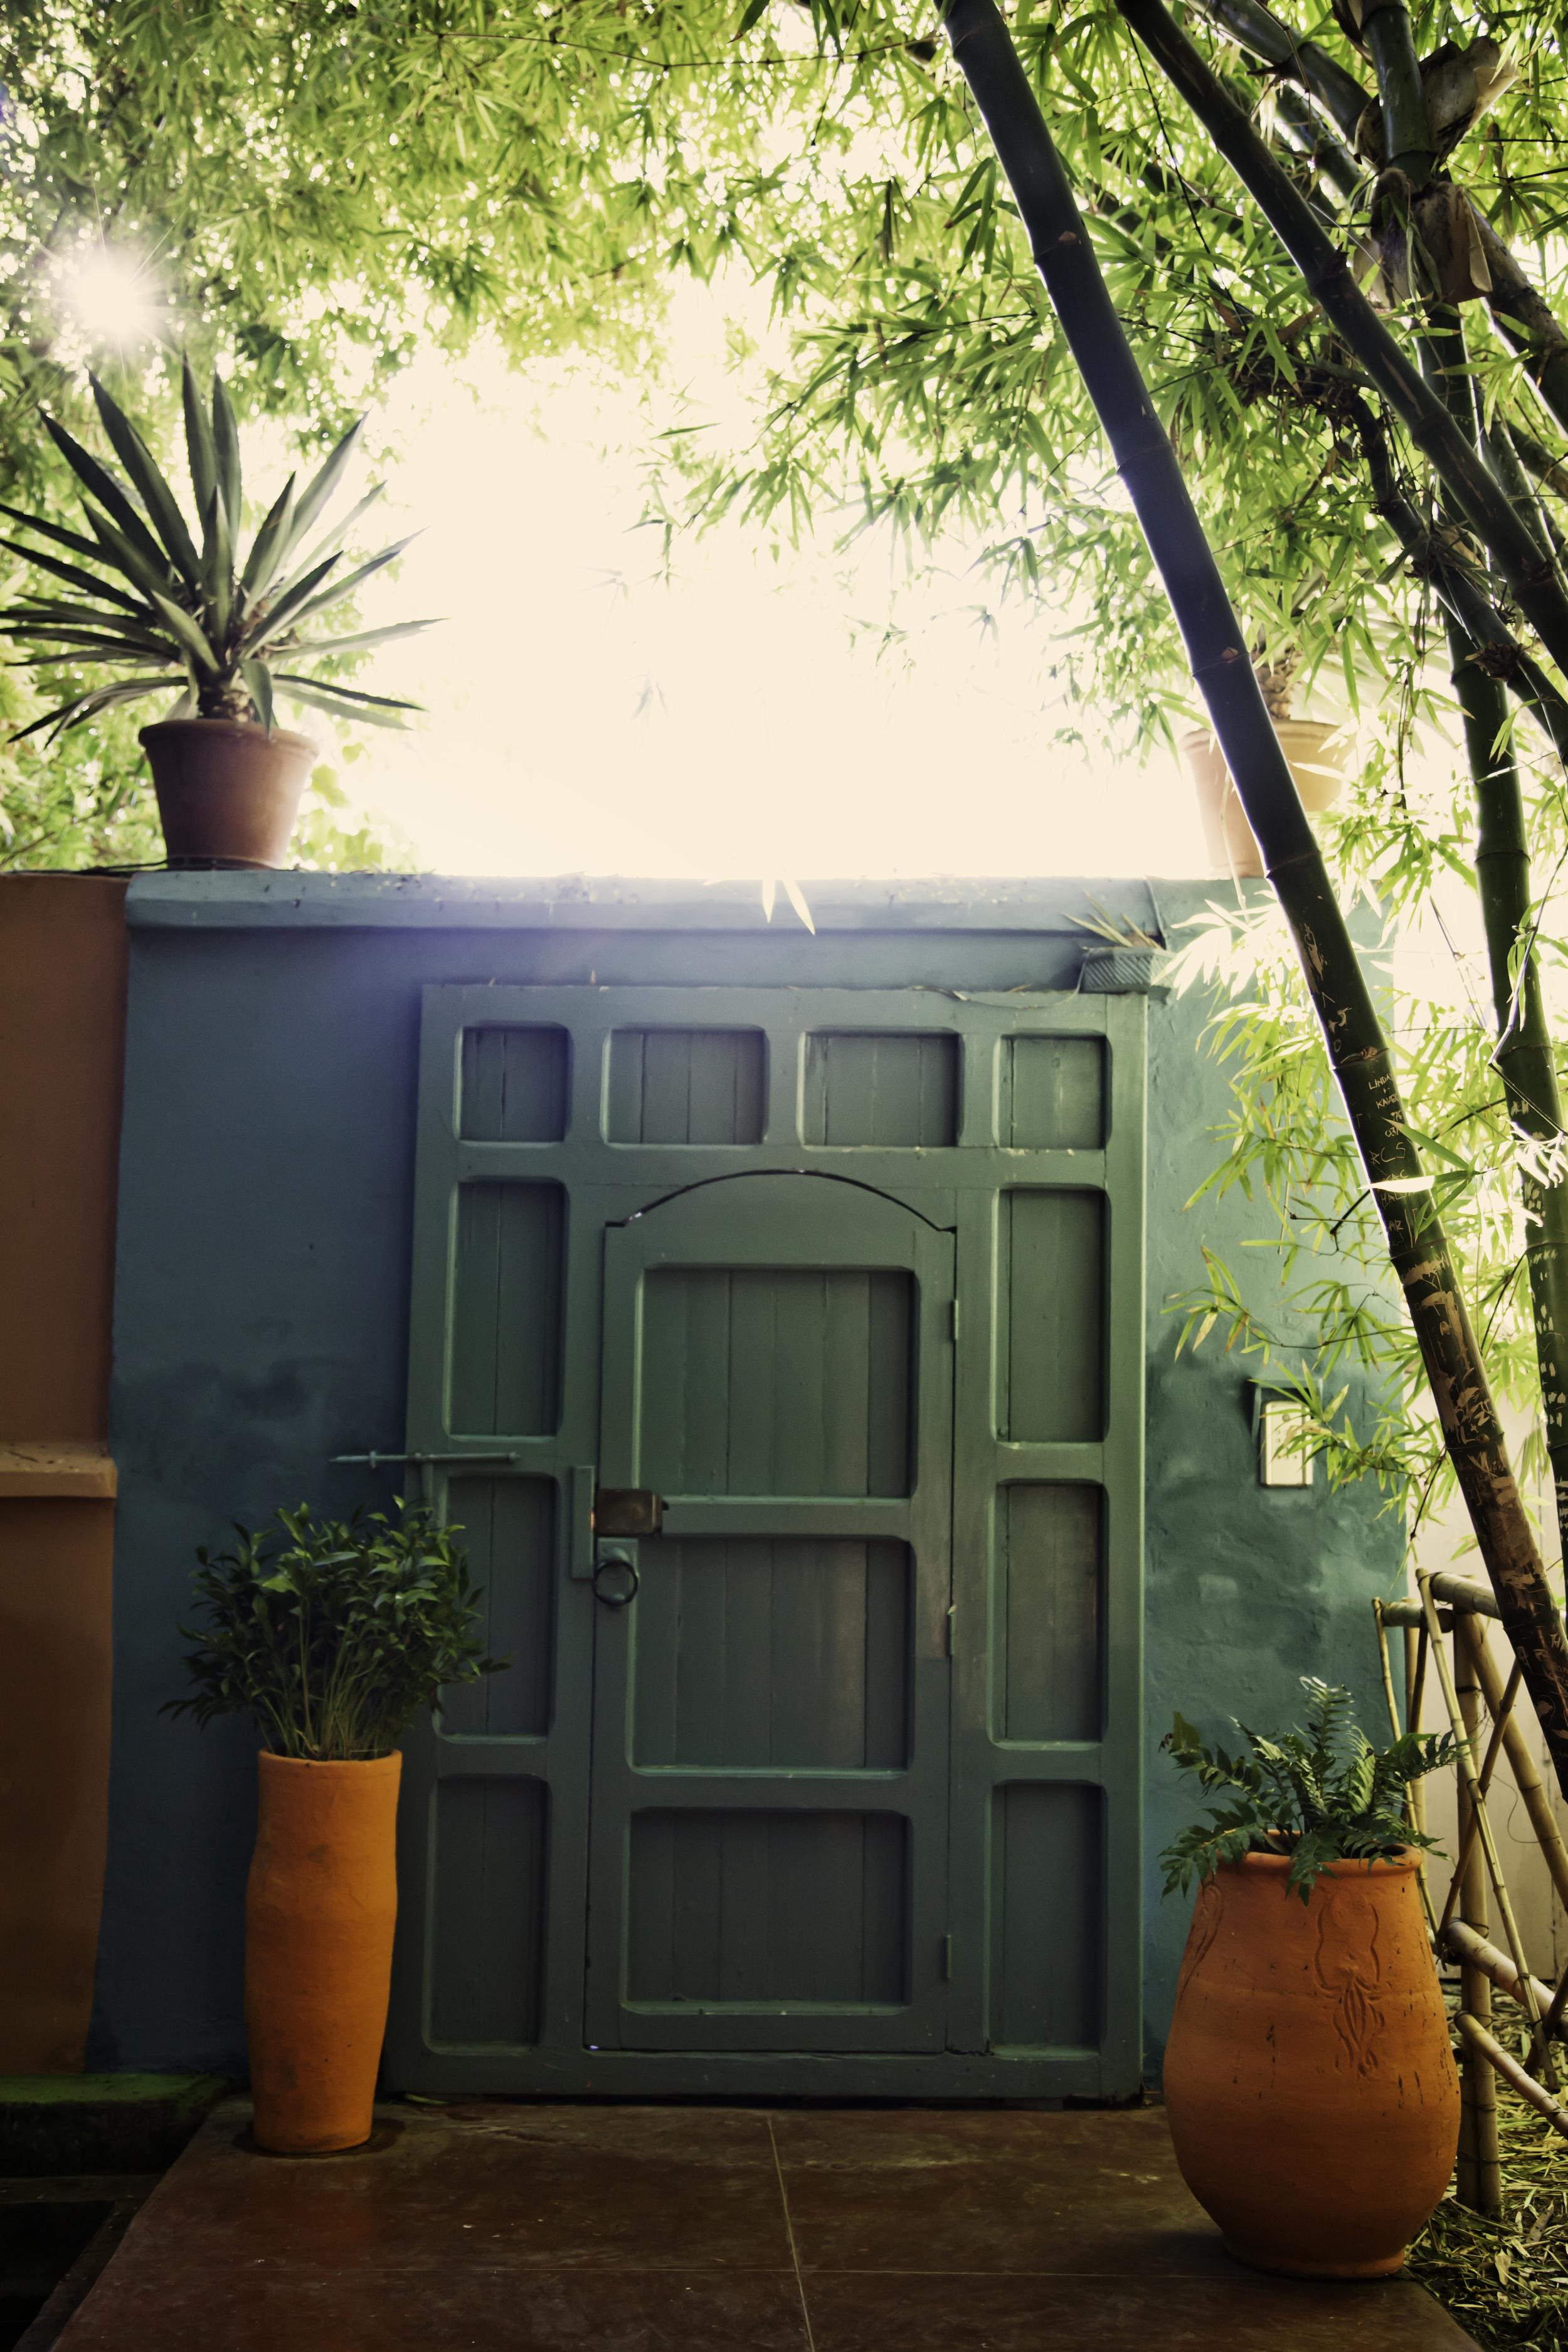 green-door-orange-vases-majorelle-gardens-travel-photographer.jpg